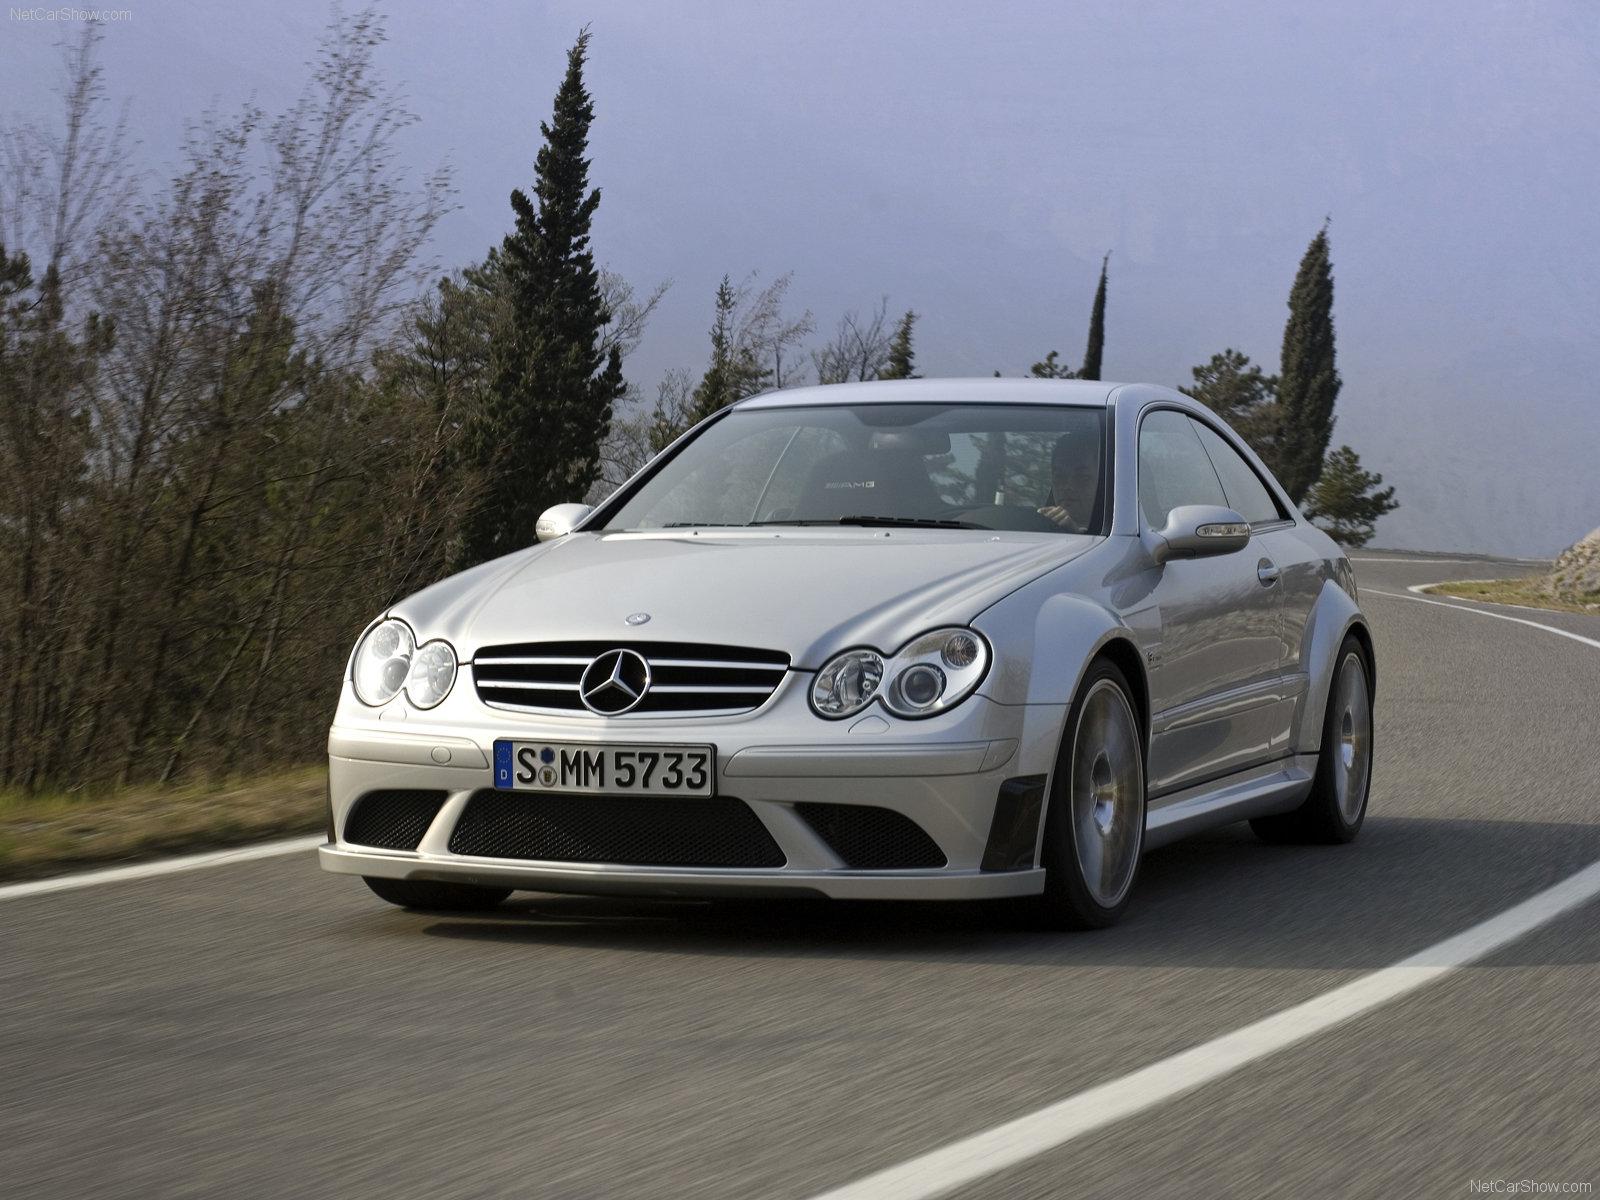 Mercedes benz clk63 amg black series photos photogallery for Mercedes benz clk63 amg black series